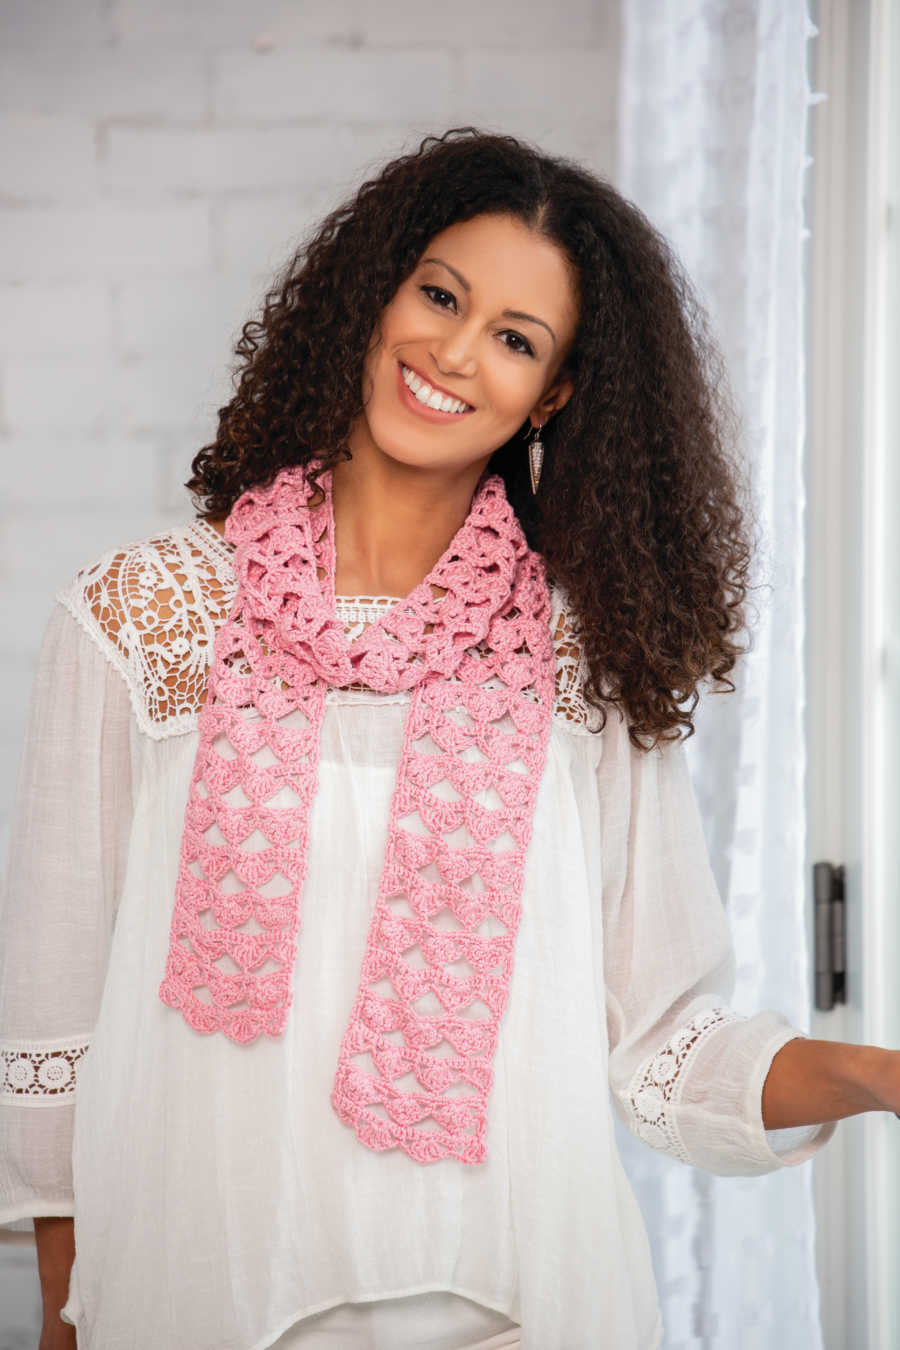 Woman wearing a handmade, pink scarf